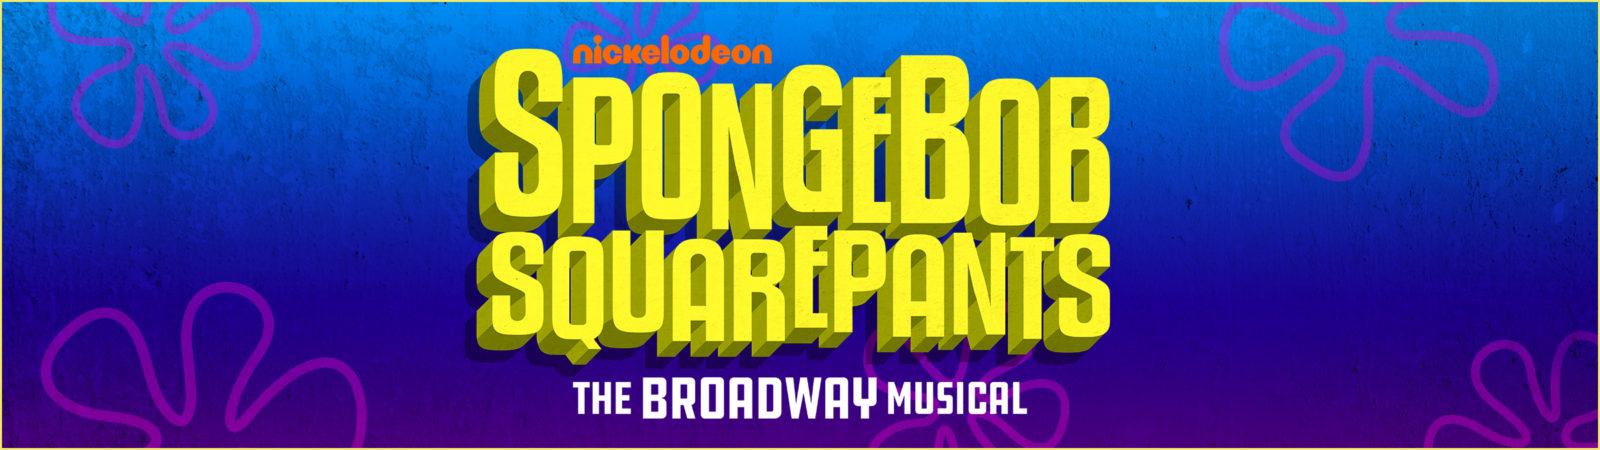 SpongeBob SquarePants Broadway